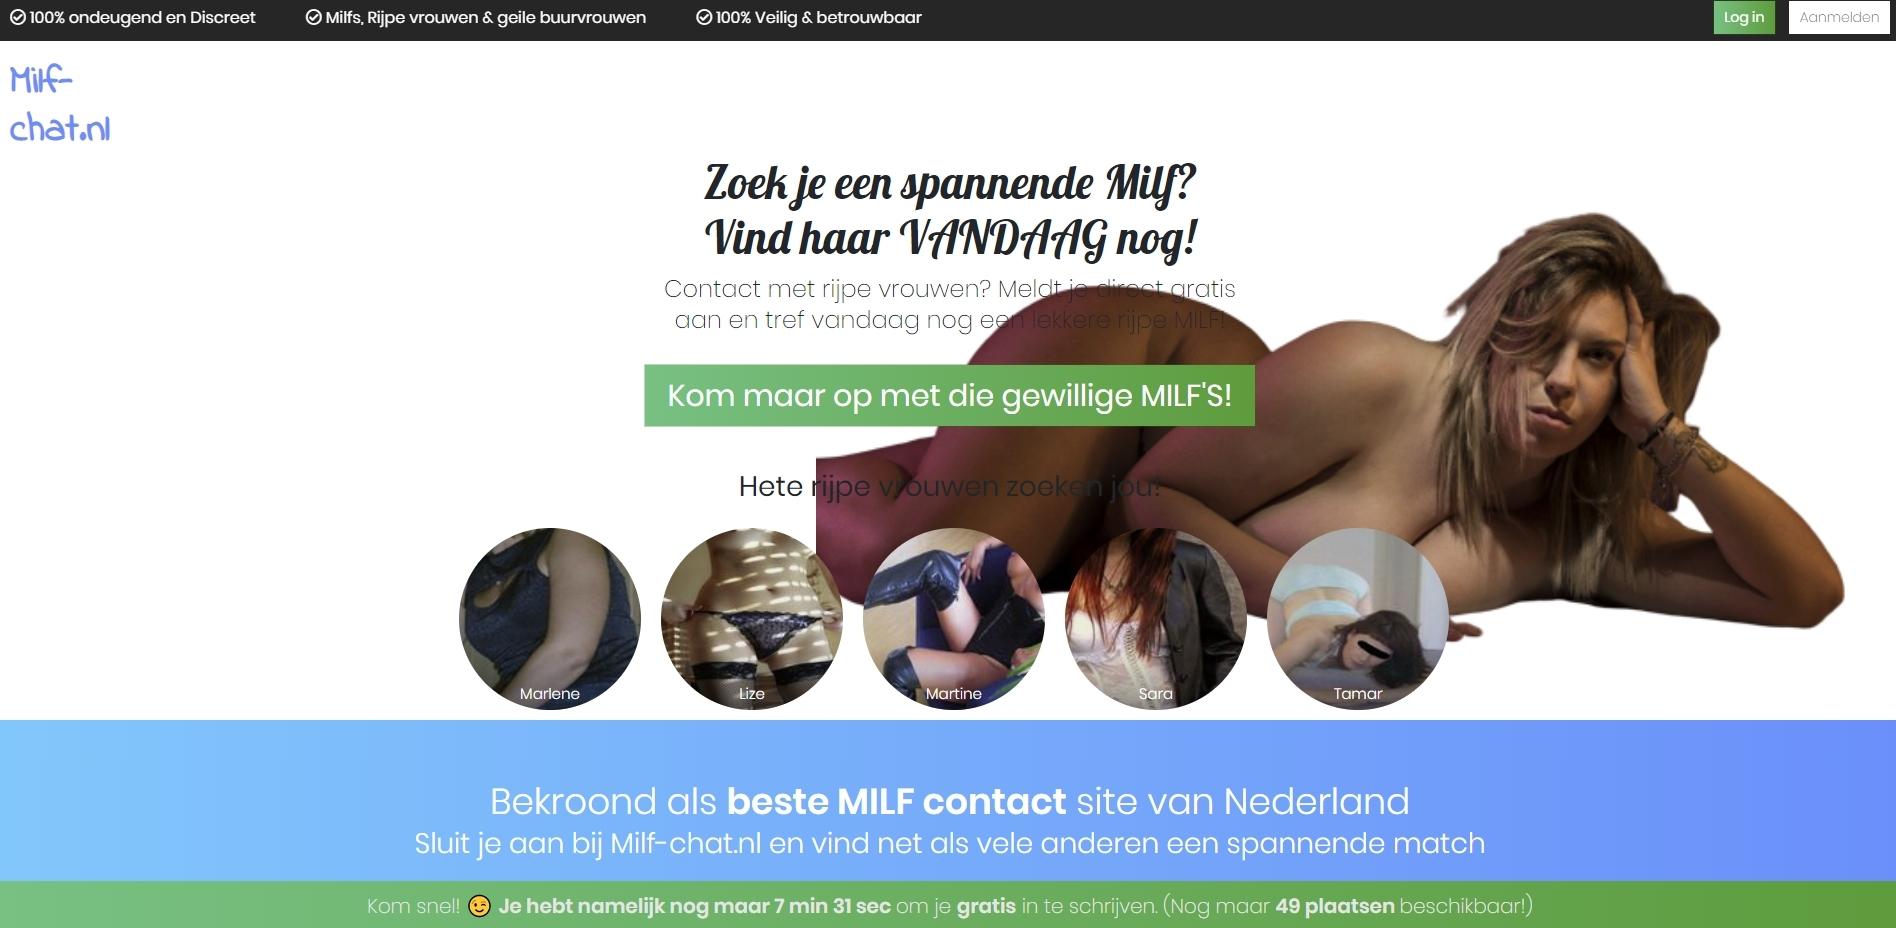 Milf-chat.nl